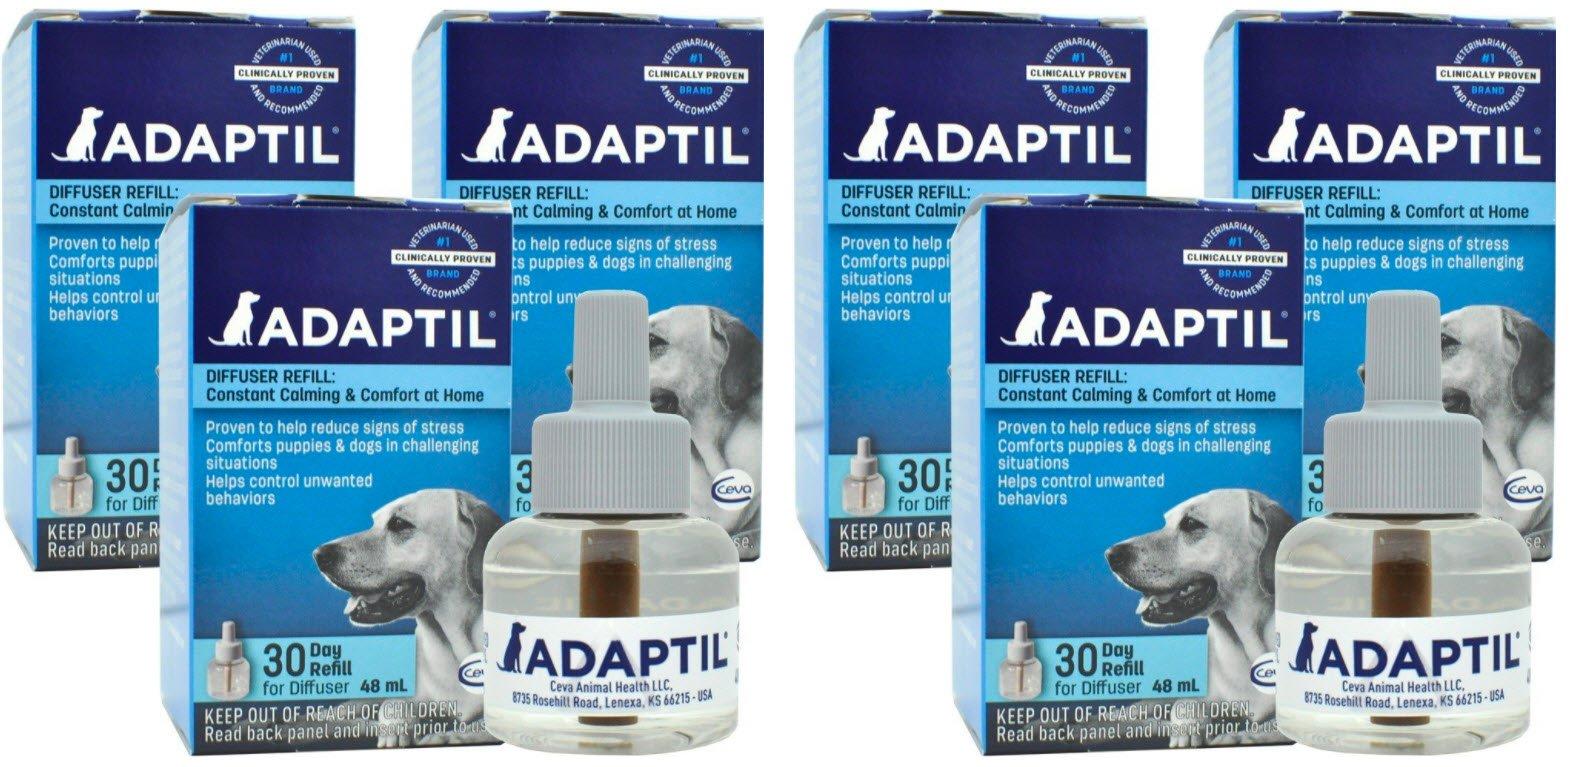 ADAPTIL (D.A.P.) Dog Appeasing Pheromone REFILL (144mL) (6-Pack)